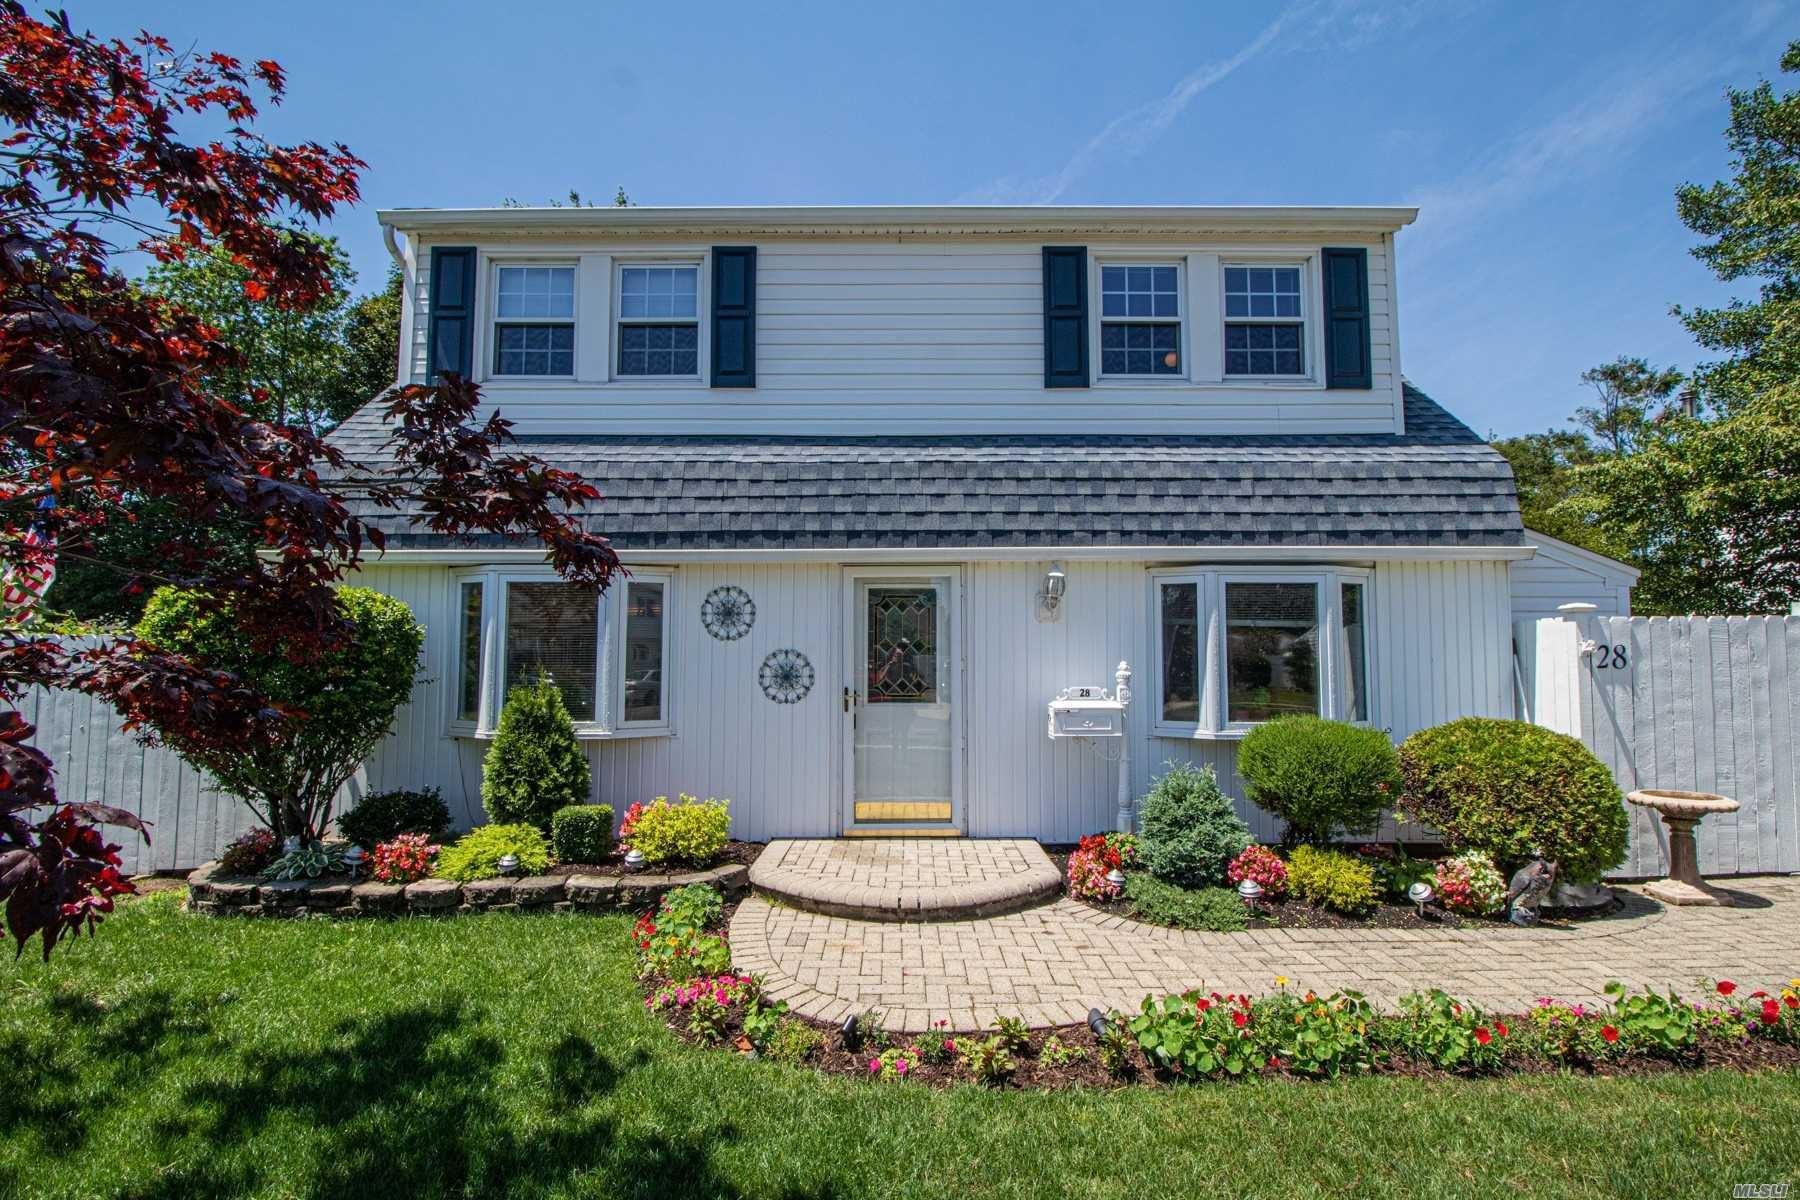 28 Crabtree Lane, Levittown, NY 11756 - MLS#: 3235755